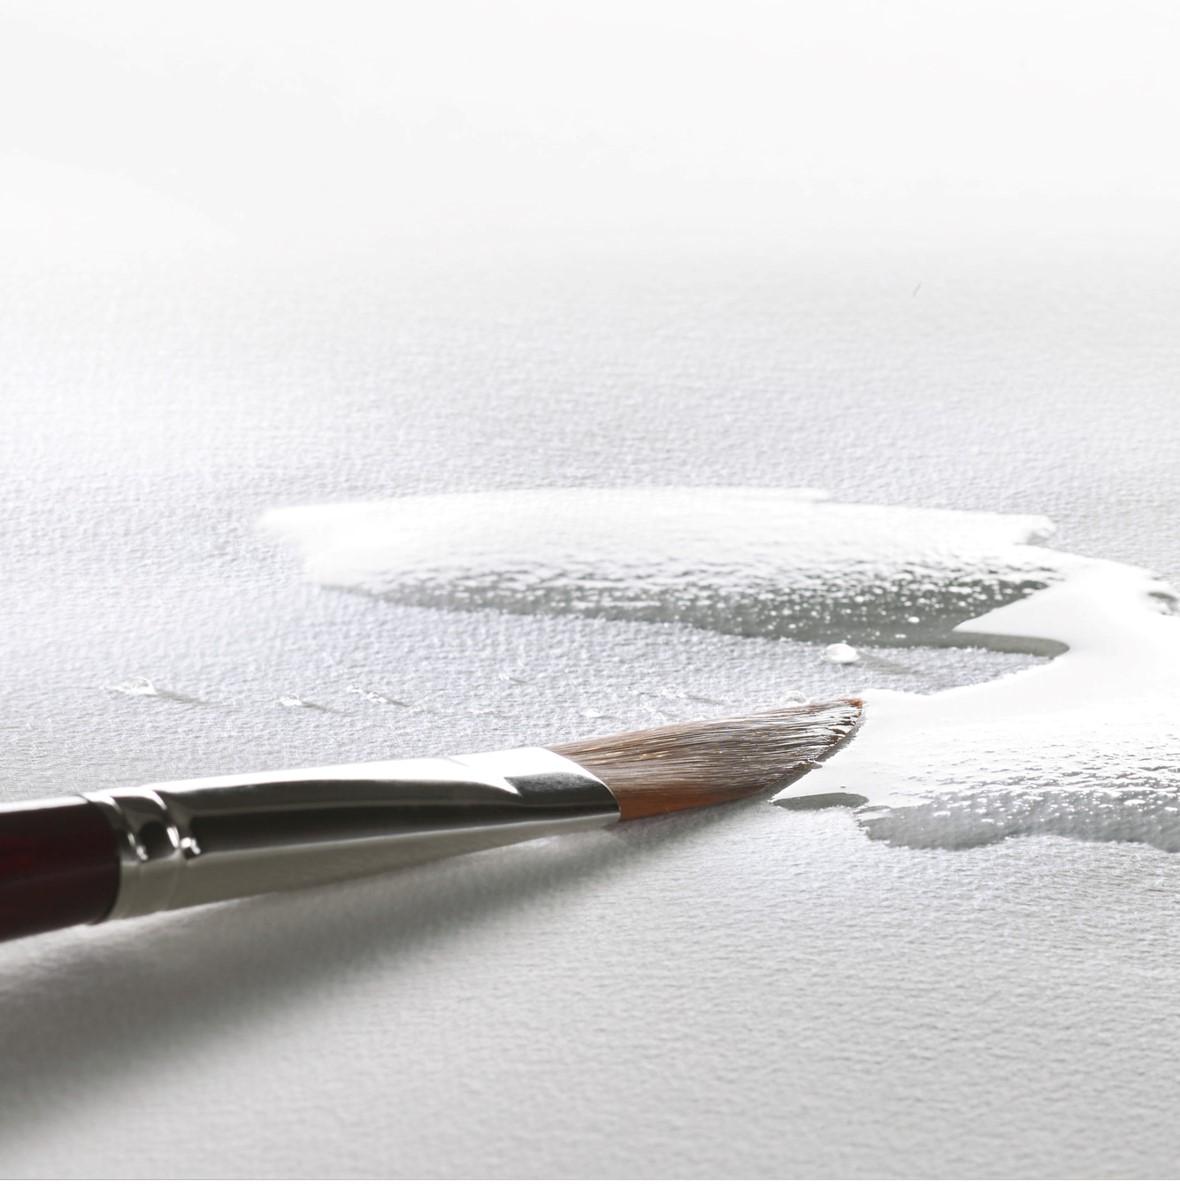 300gsm Cold Press Watercolor Paper - Lanaquarelle